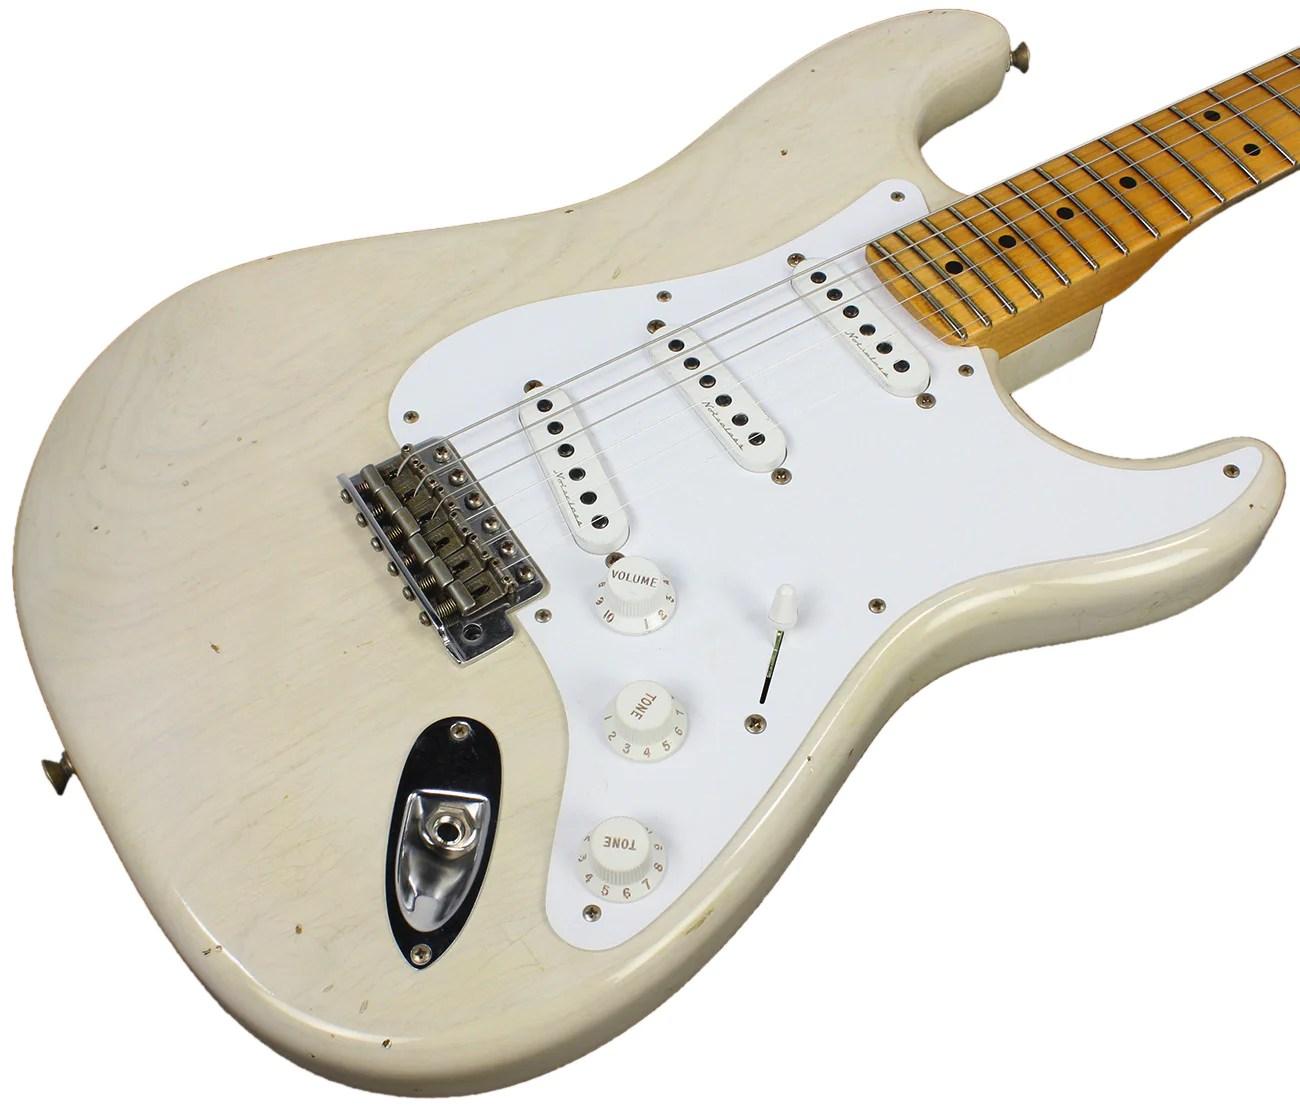 hight resolution of fender custom shop eric clapton journeyman stratocaster relic guitar aged white blonde humbucker music